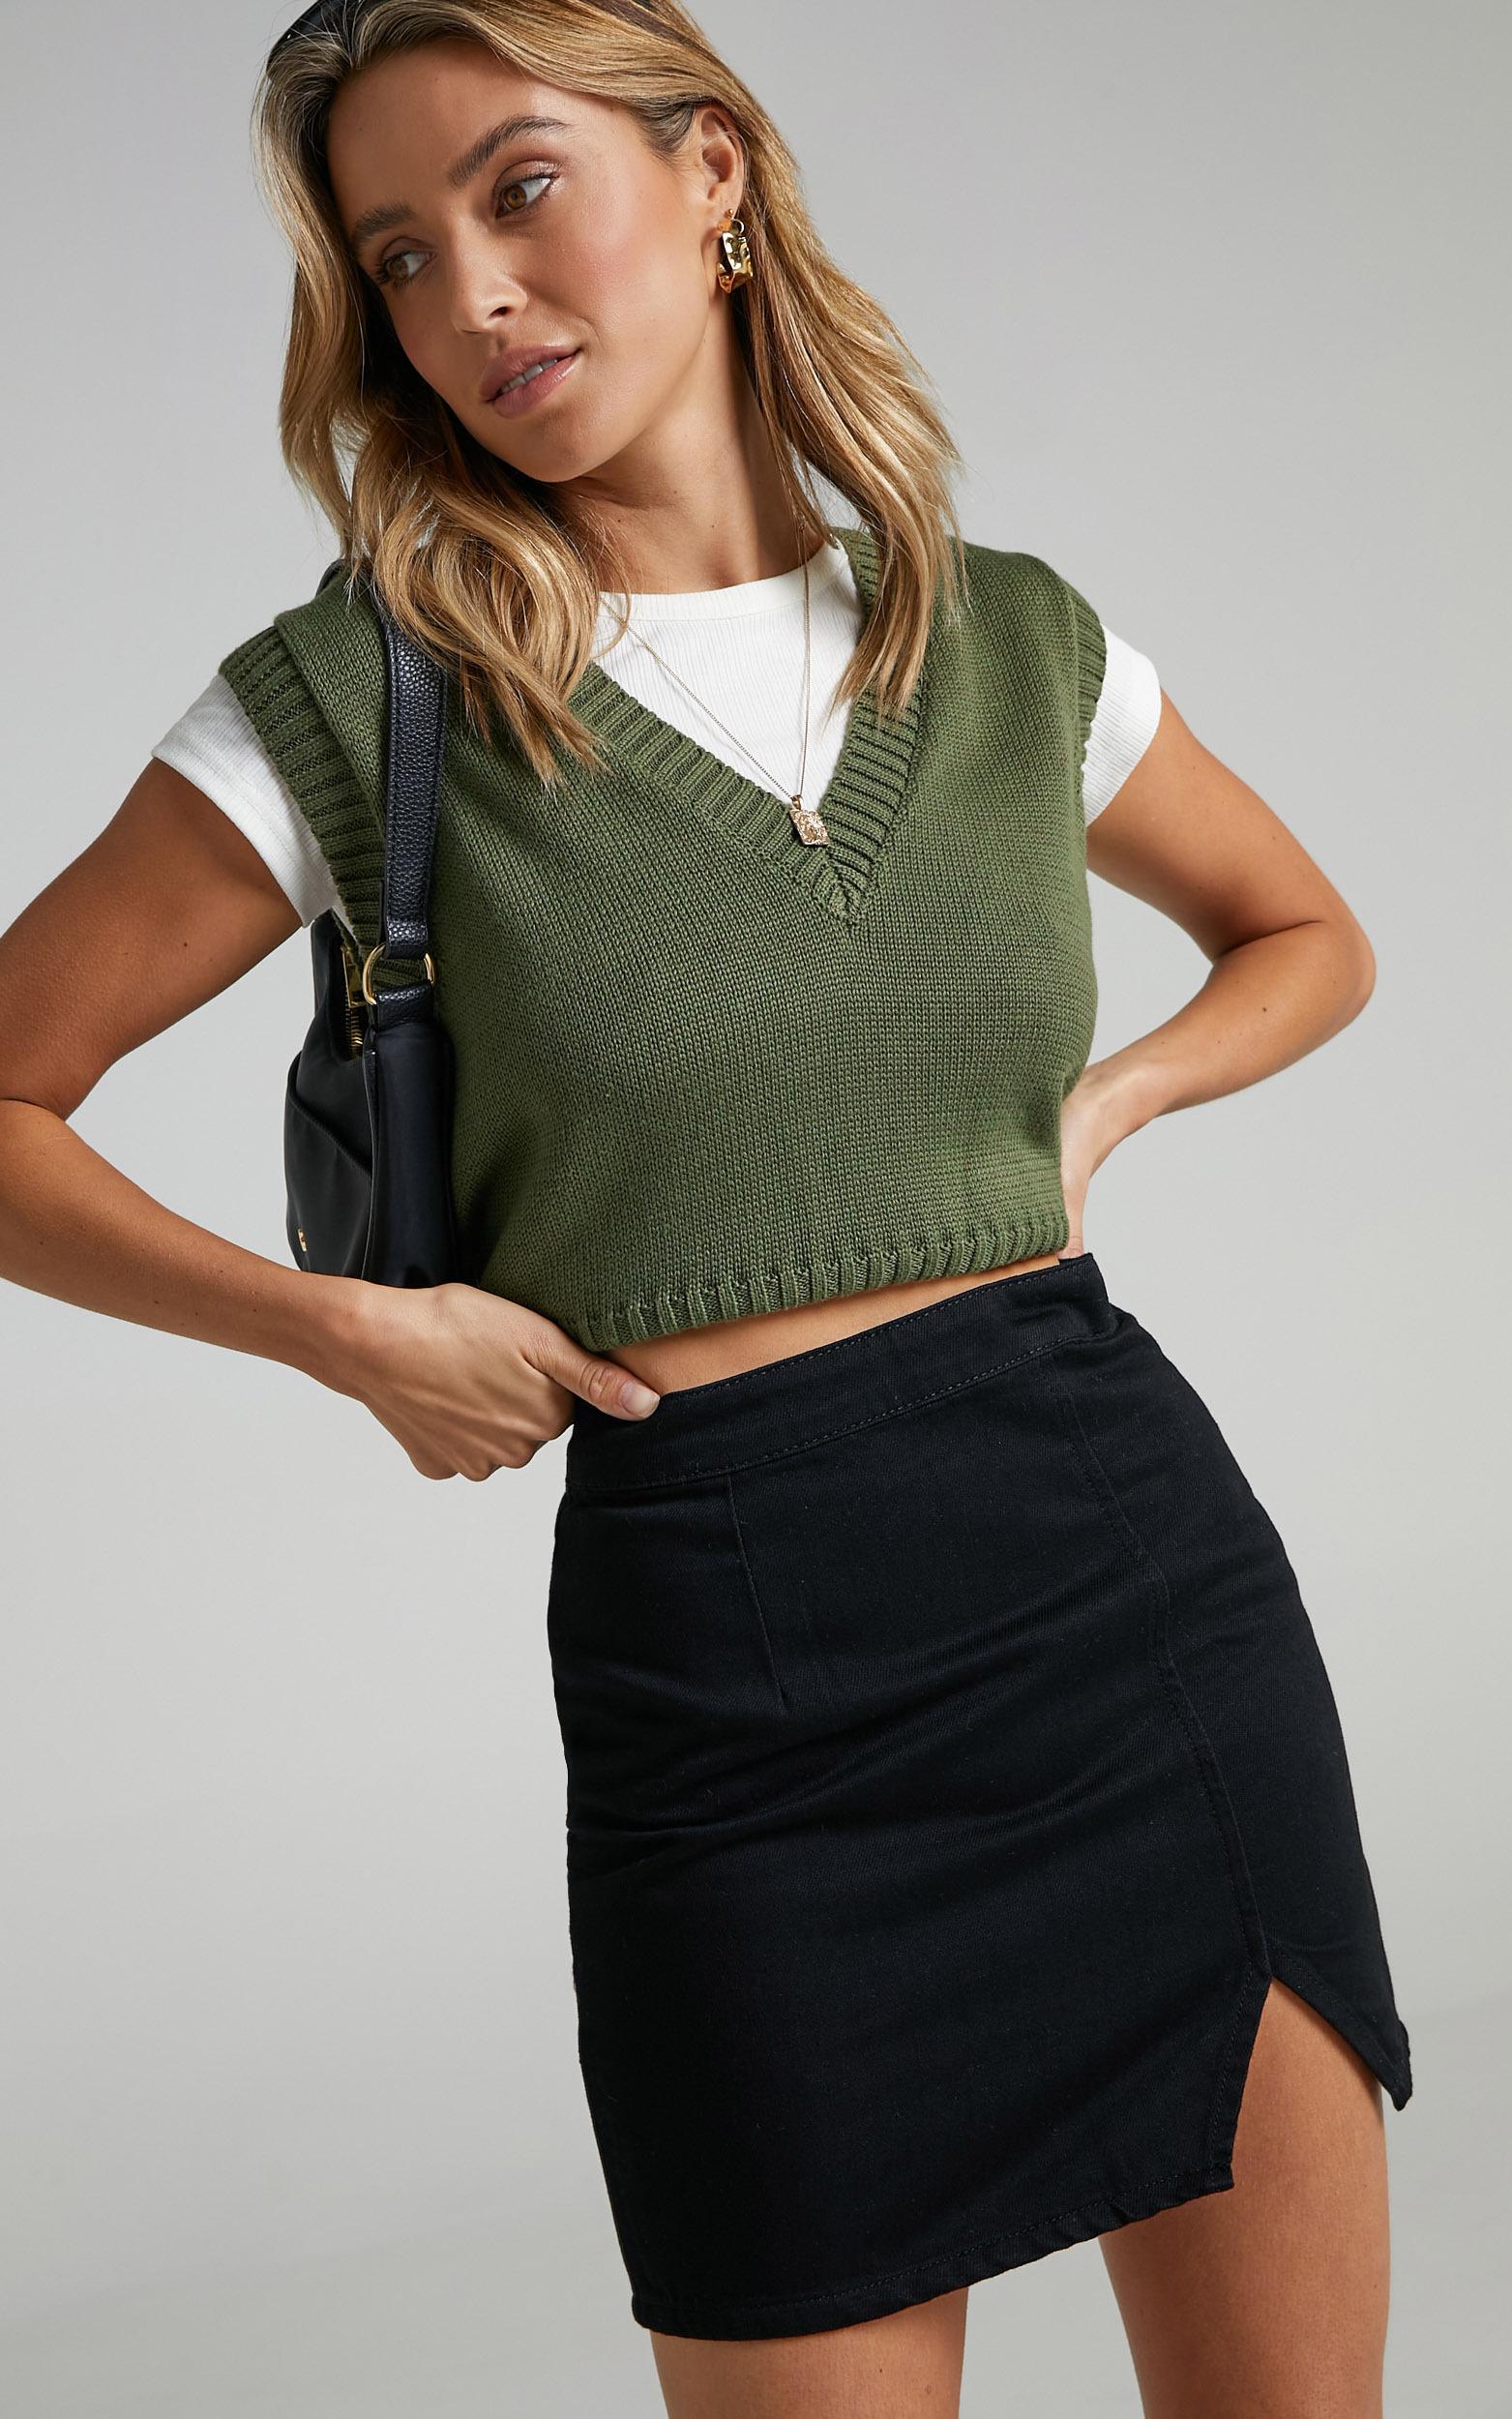 Not Kidding Around Denim Skirt In Black - 20 (XXXXL), Black, hi-res image number null